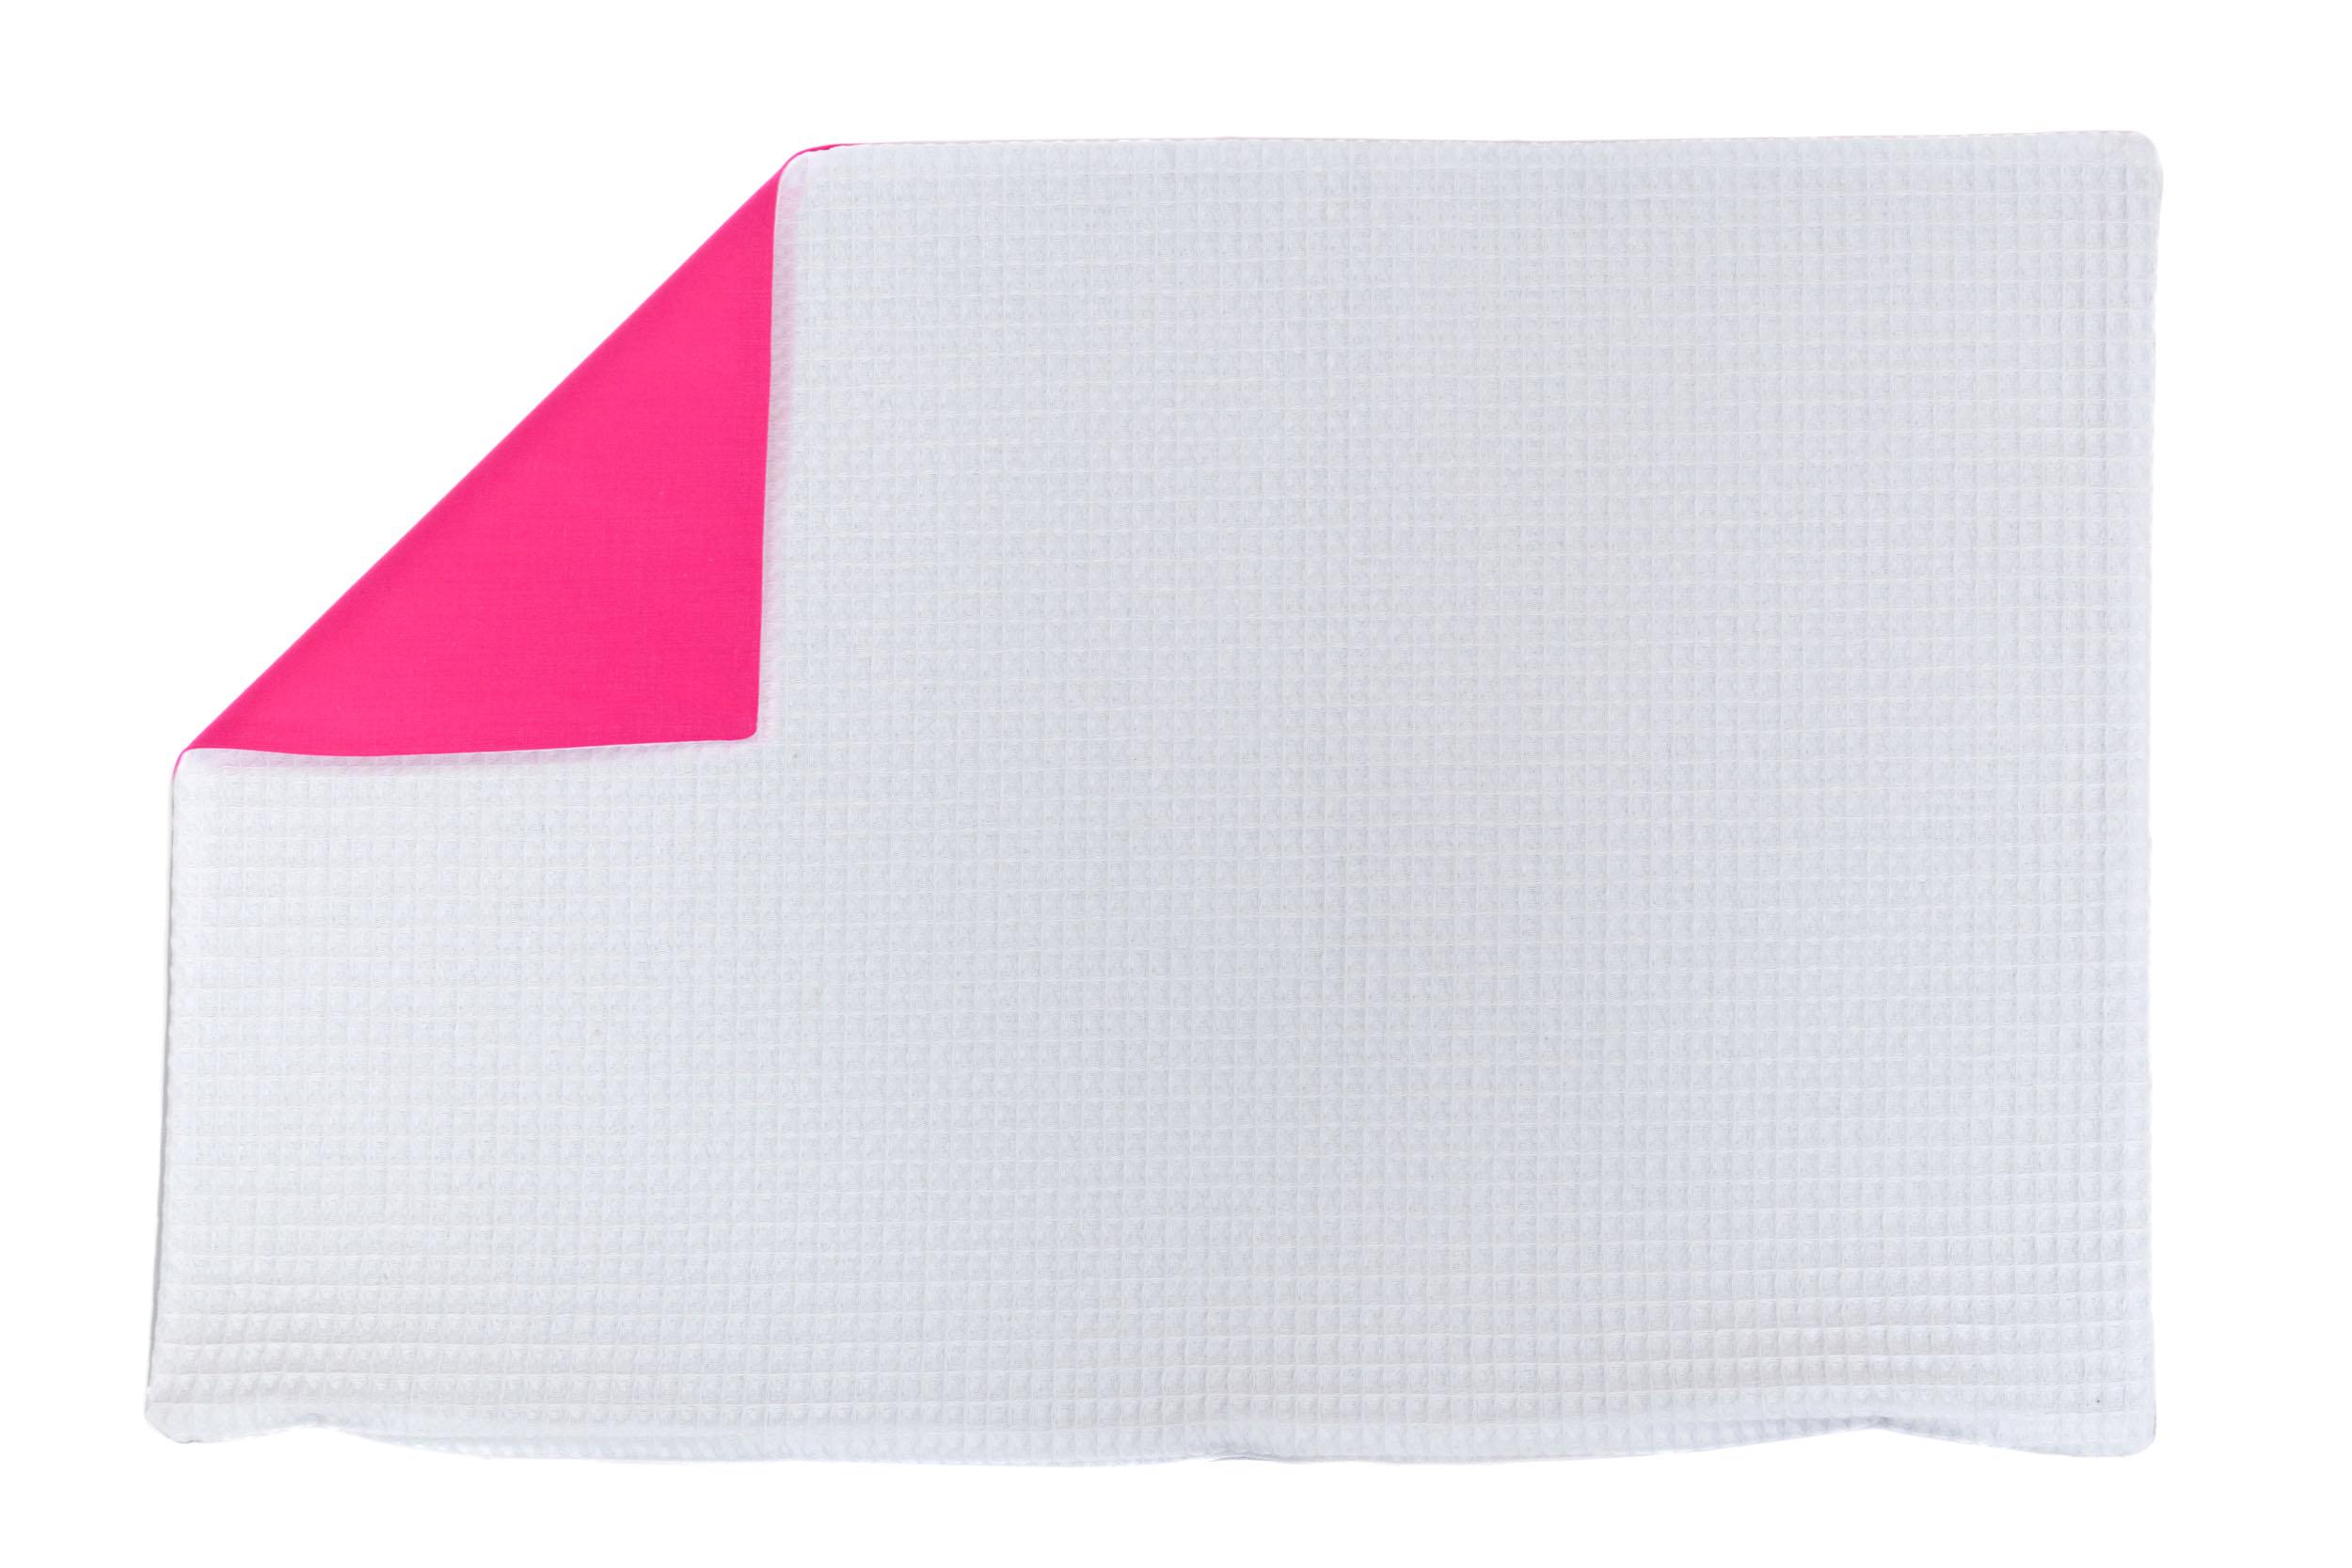 Kissenhülle Zierkissenbezug Kissenbezug ca. 60x40 cm für Kissen oder Dekokissen Weiß Dunkelrosa